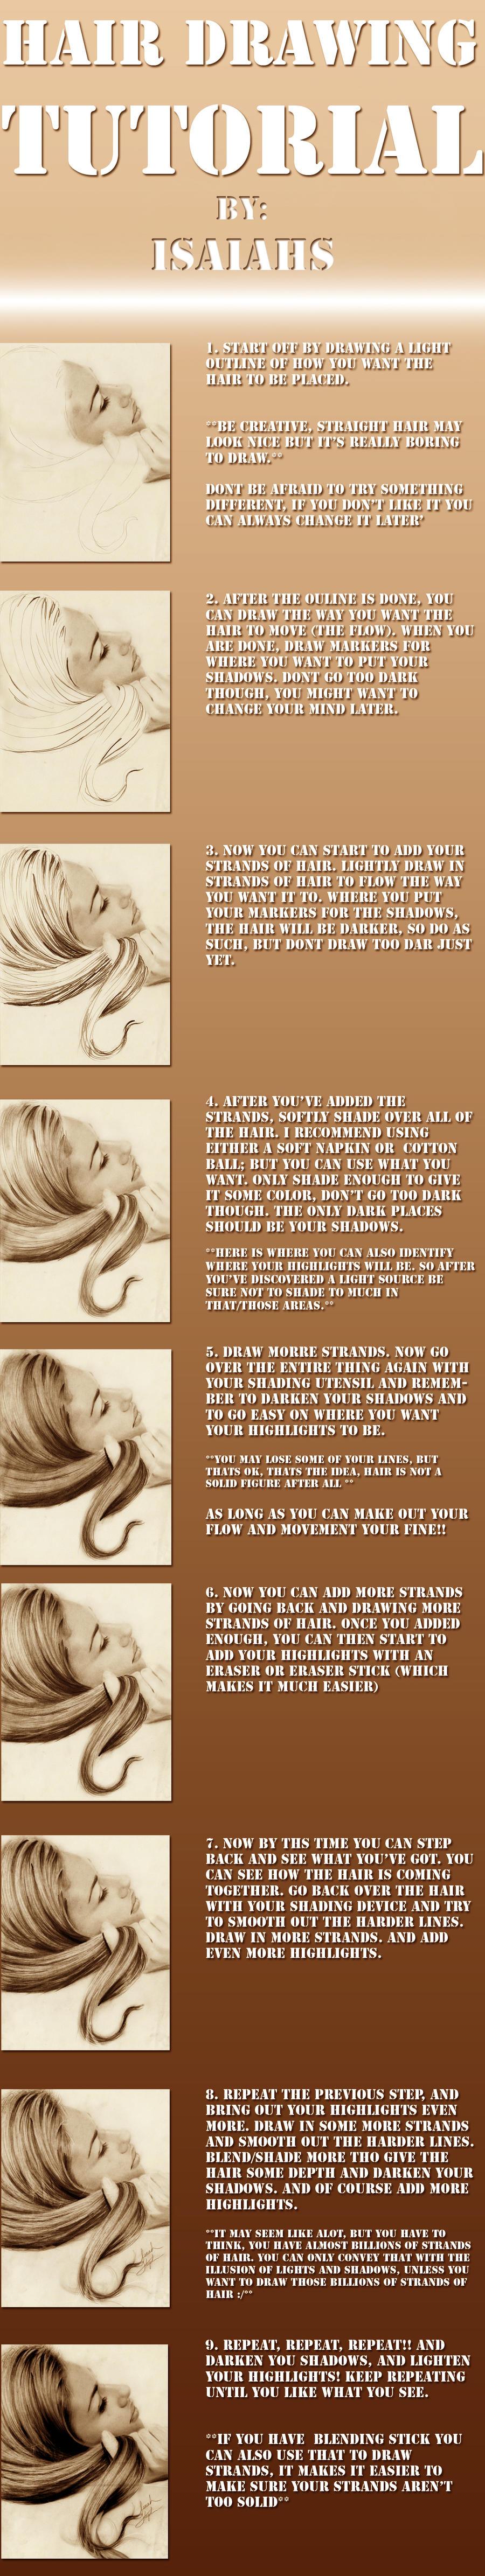 .Hair Drawing tutorial by IsaiahStephens